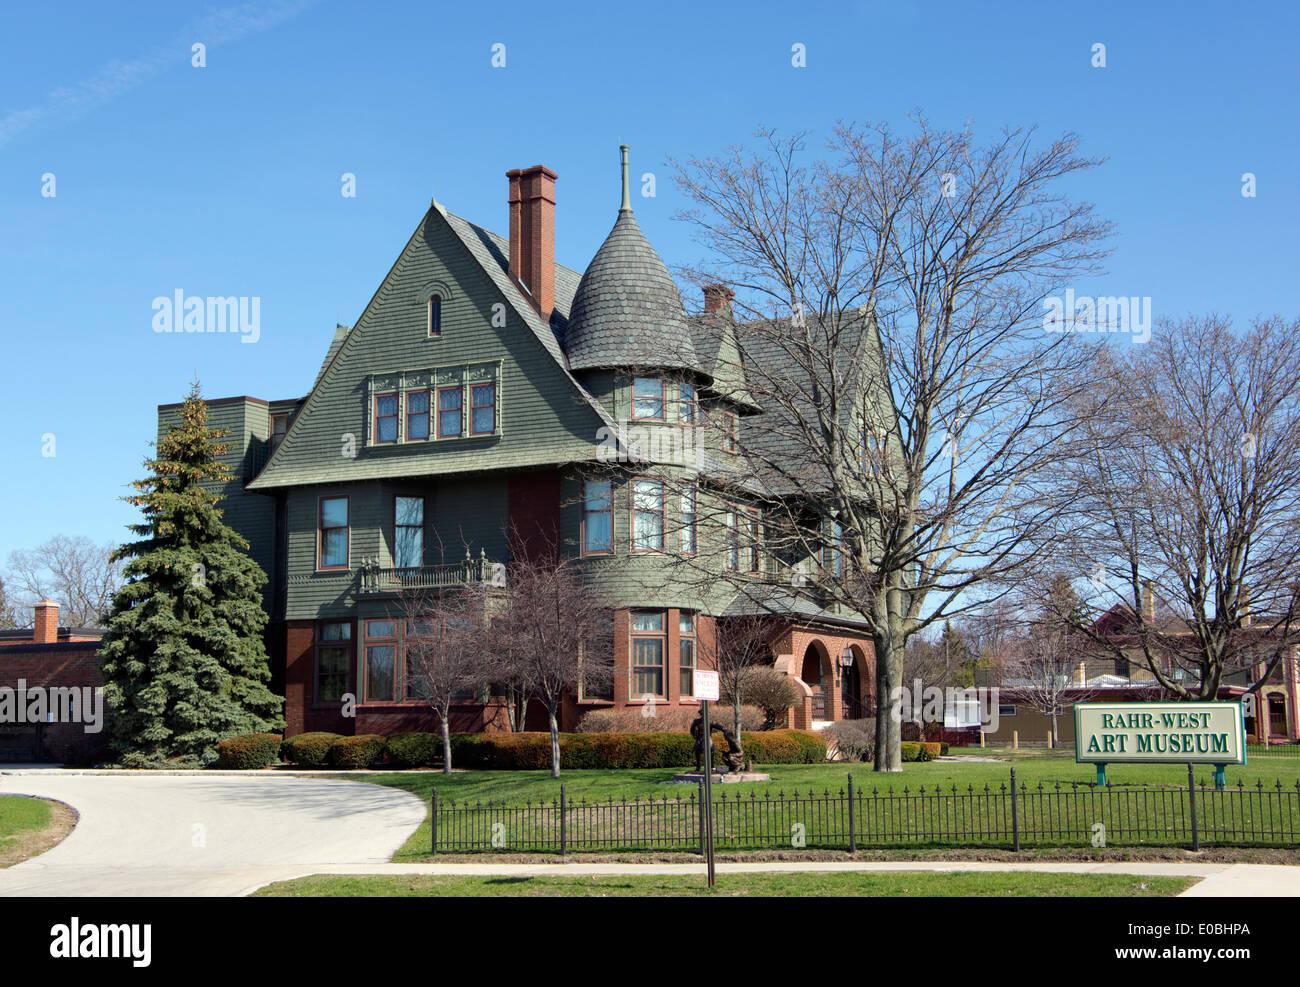 Rahr-west Art Museum Manitowoc Wisconsin Stock Photo, Royalty Free ...